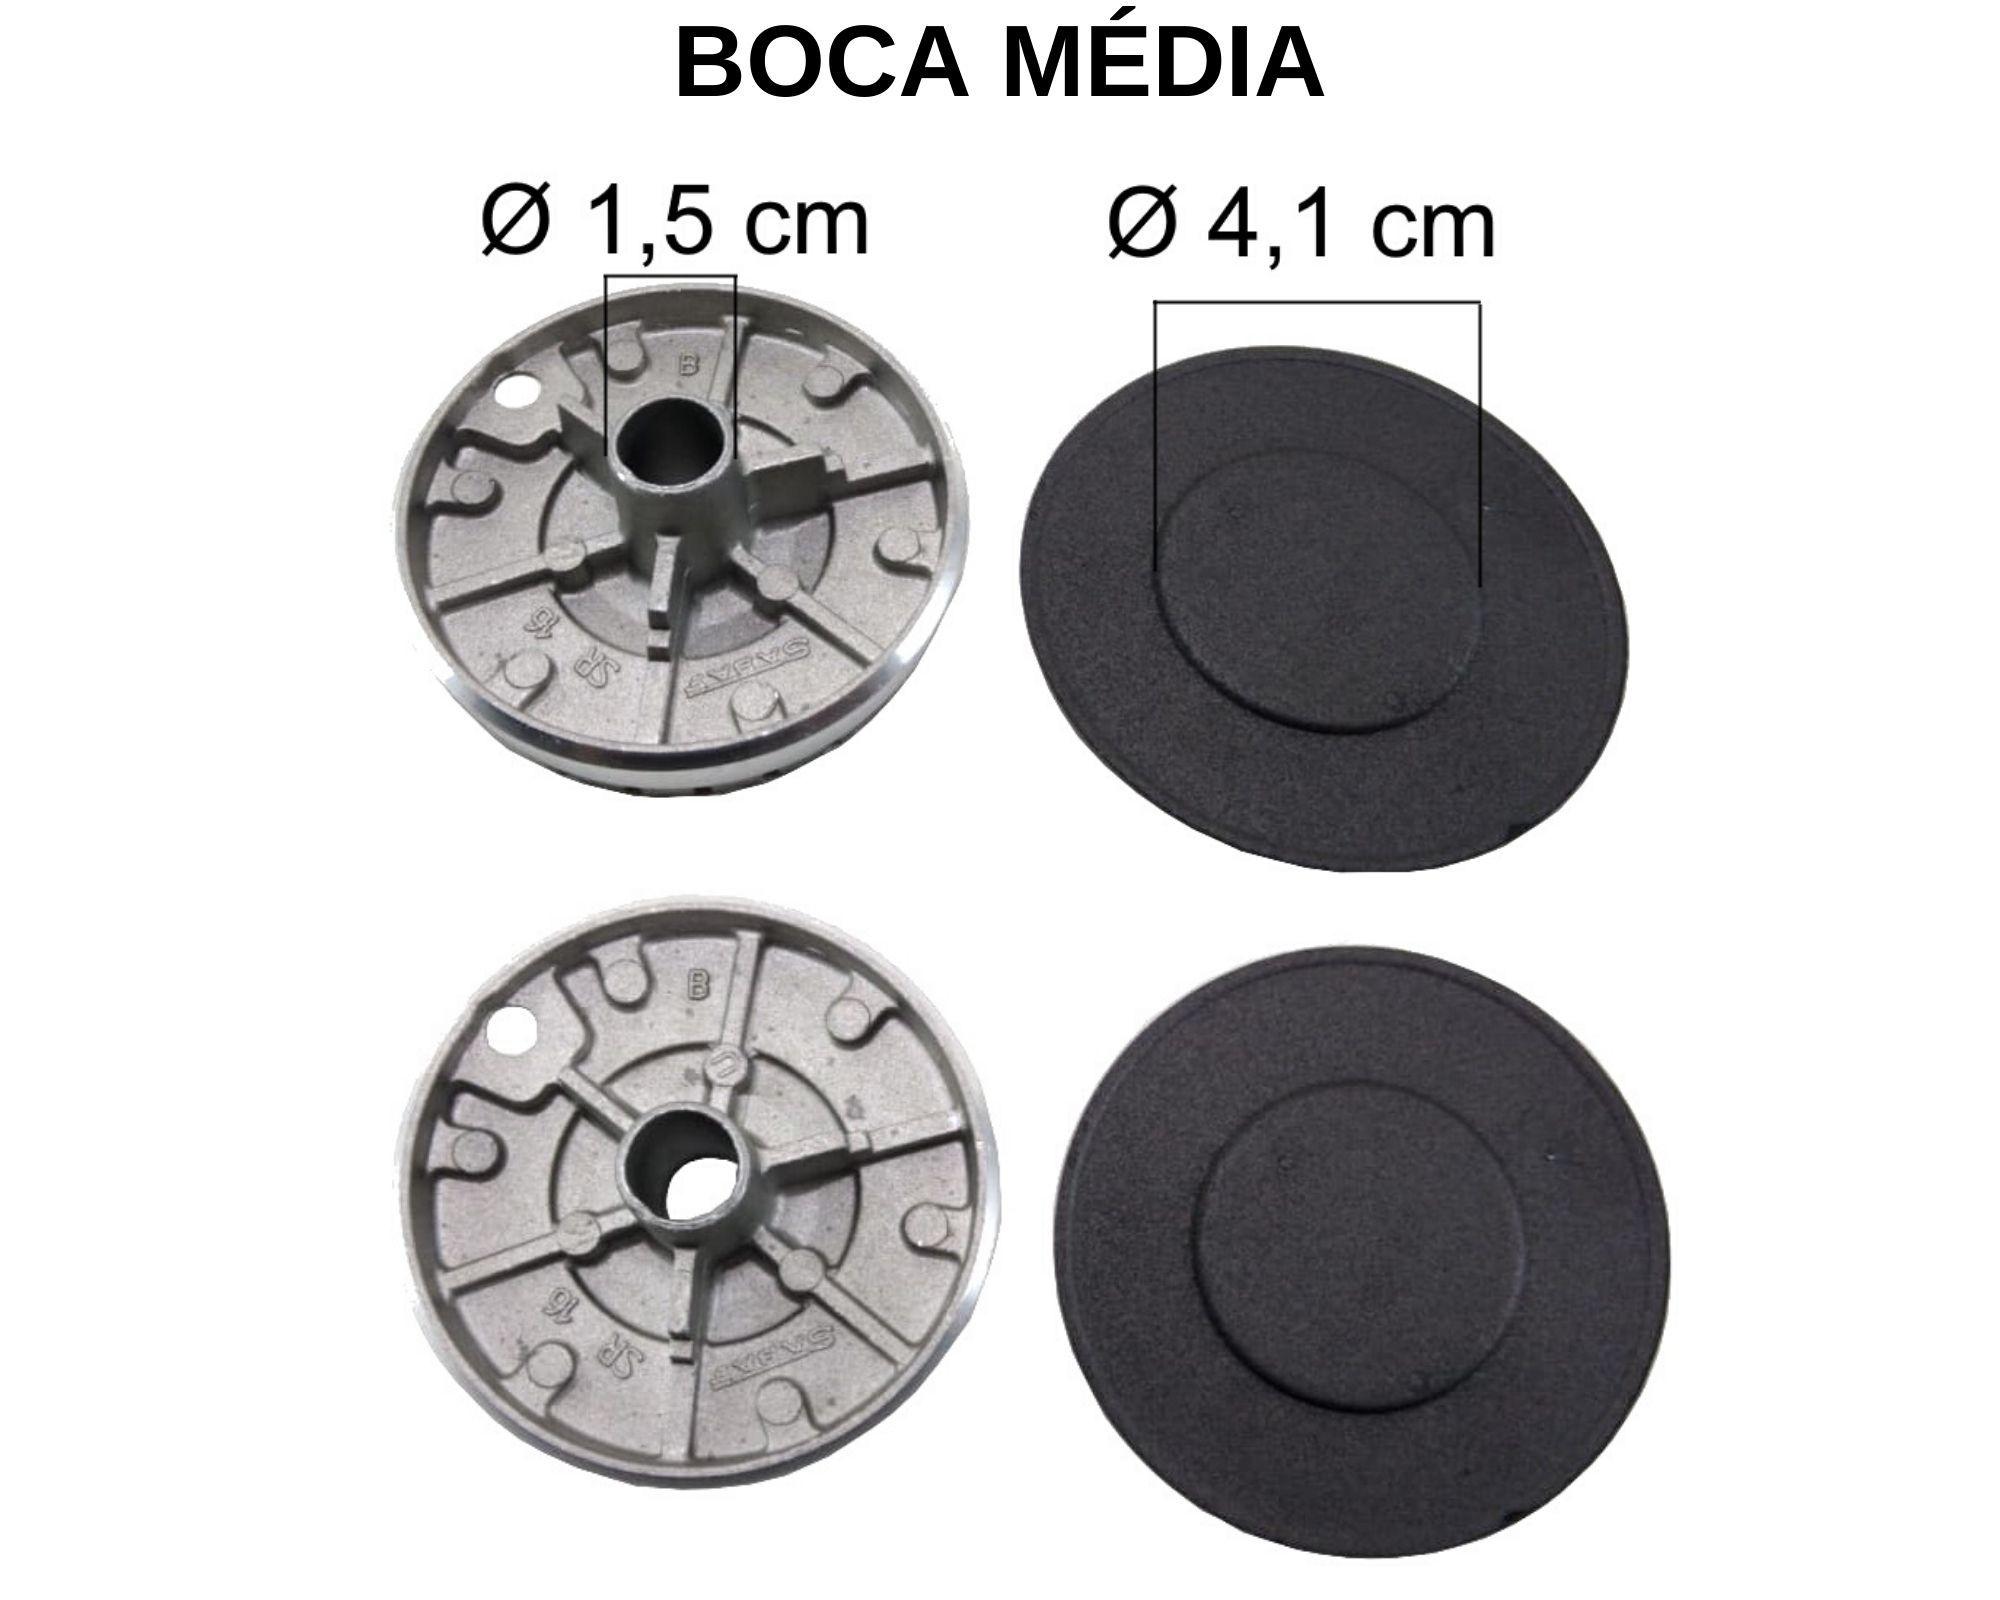 Kit Queimadores Fogão COOKTOP FISCHER 4 Bocas - Ref. KQFCF4B